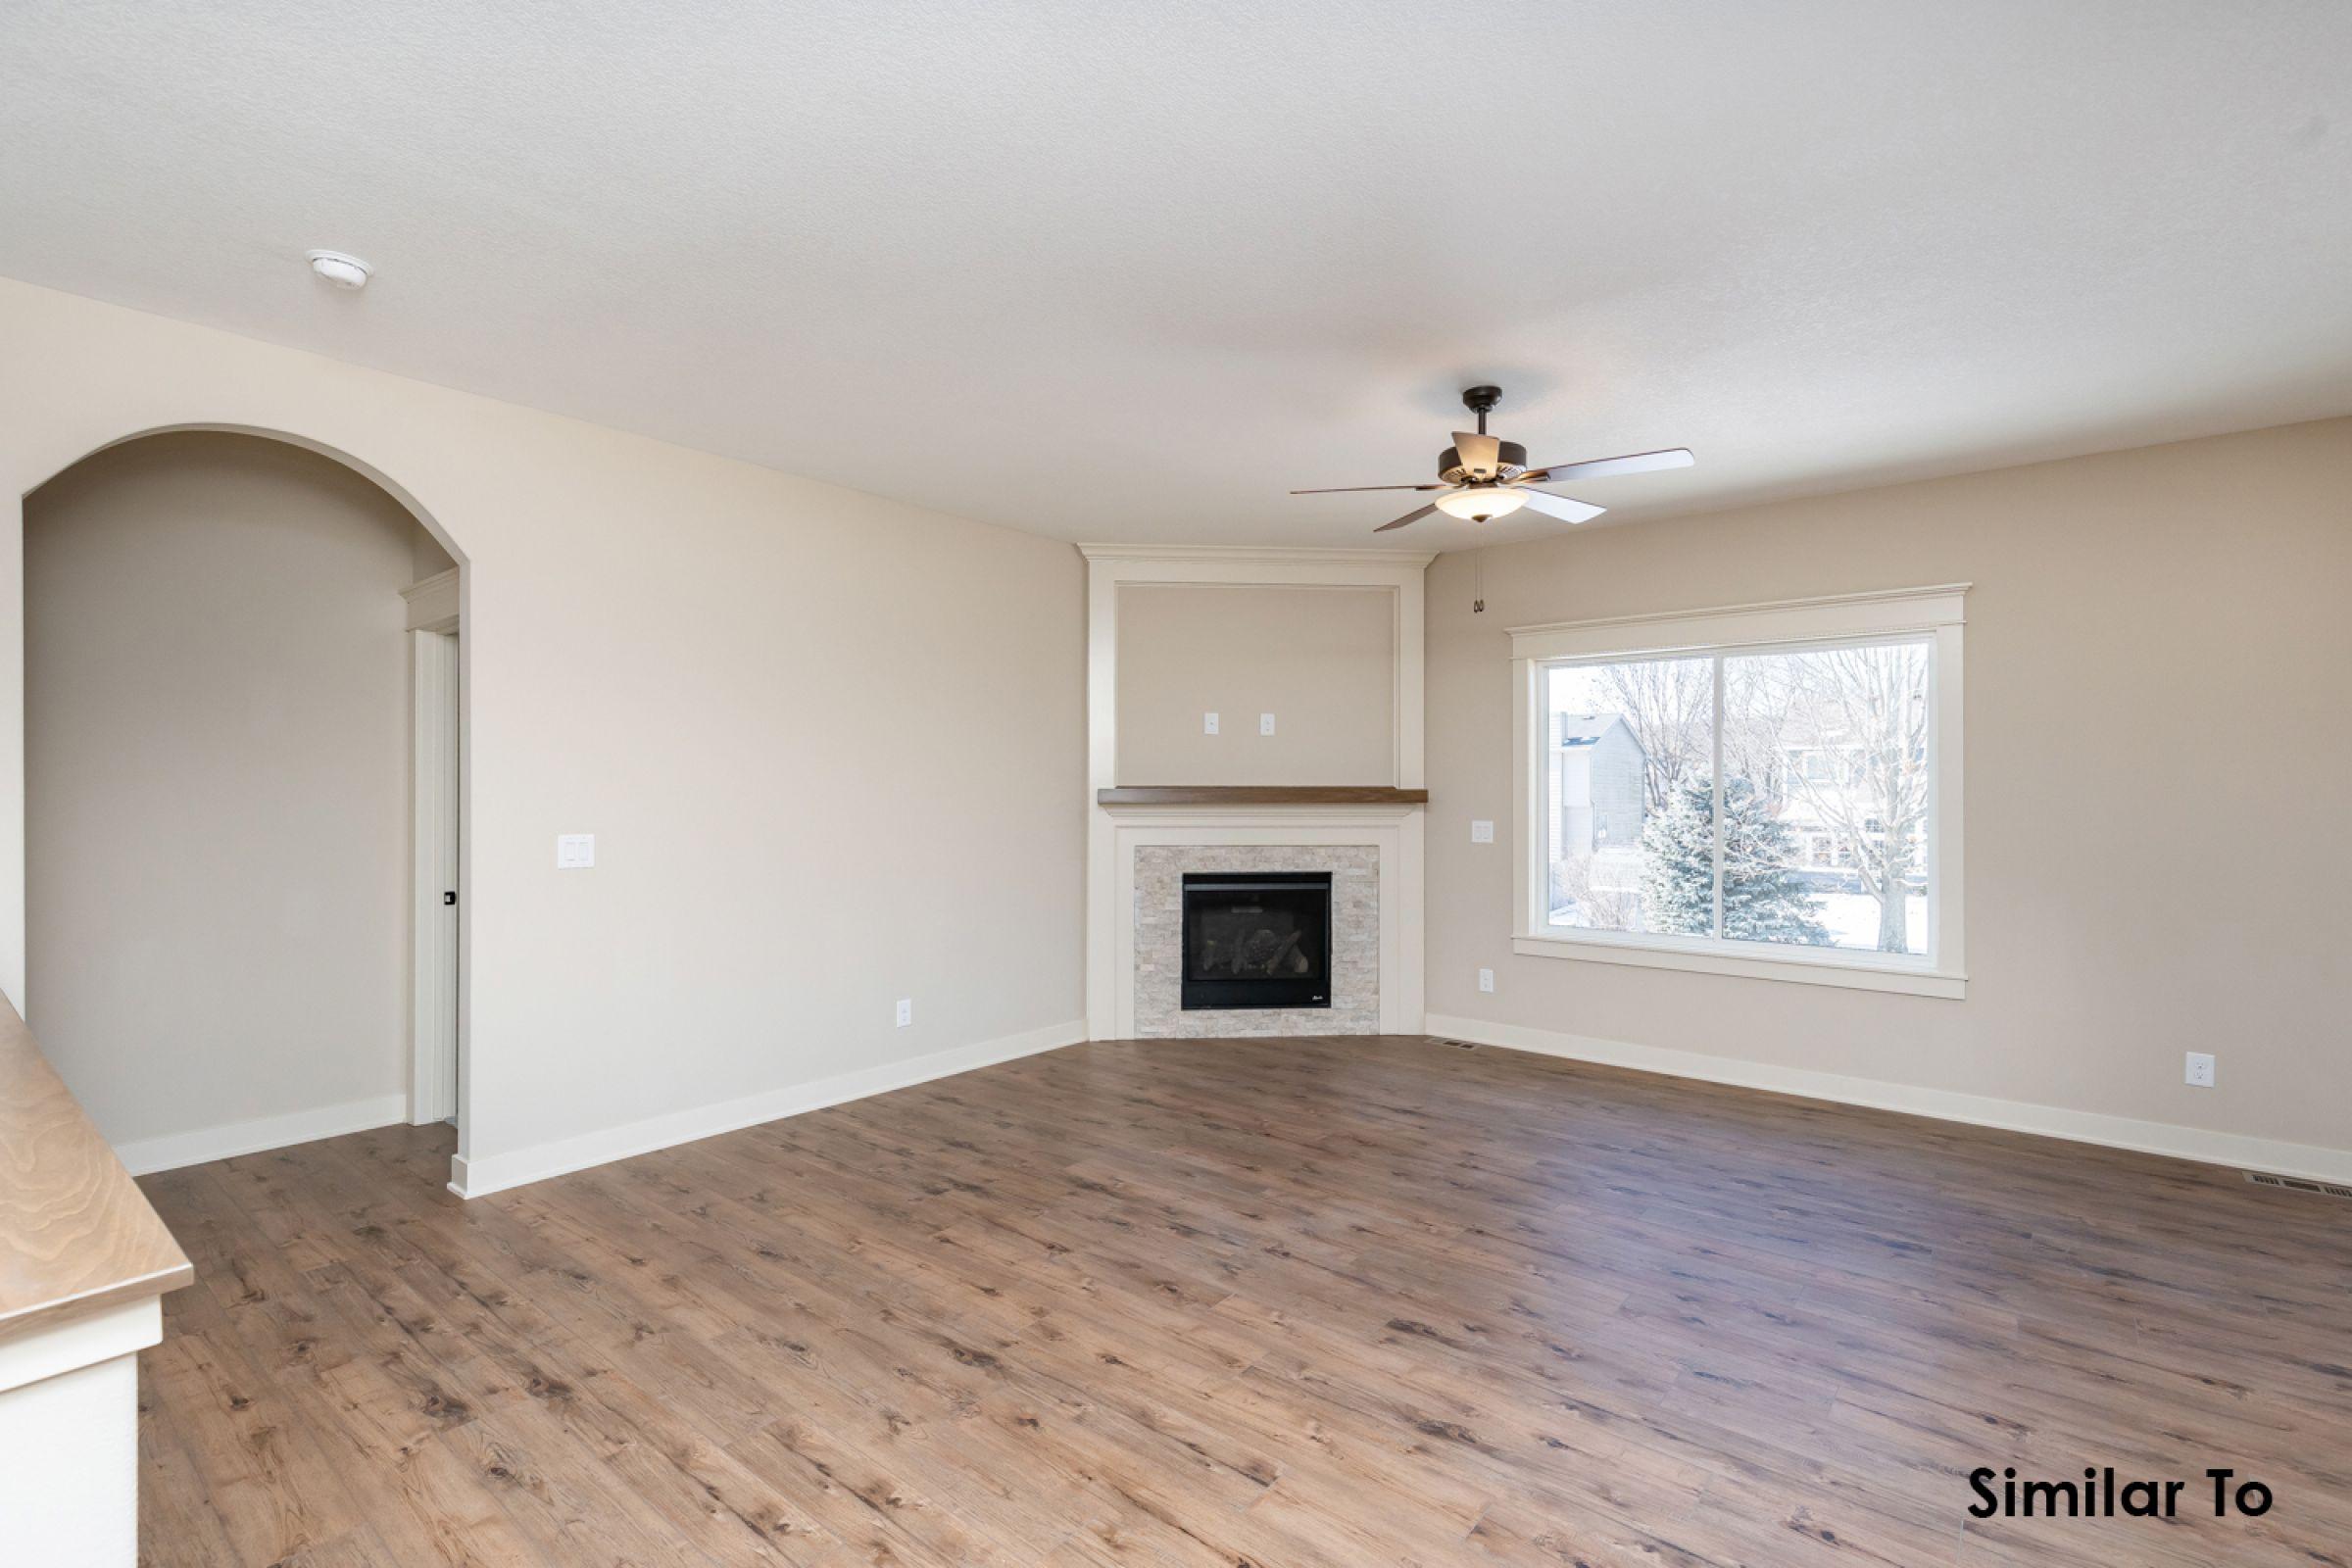 residential-warren-county-iowa-1-acres-listing-number-14995-9-2020-08-03-165351.jpg